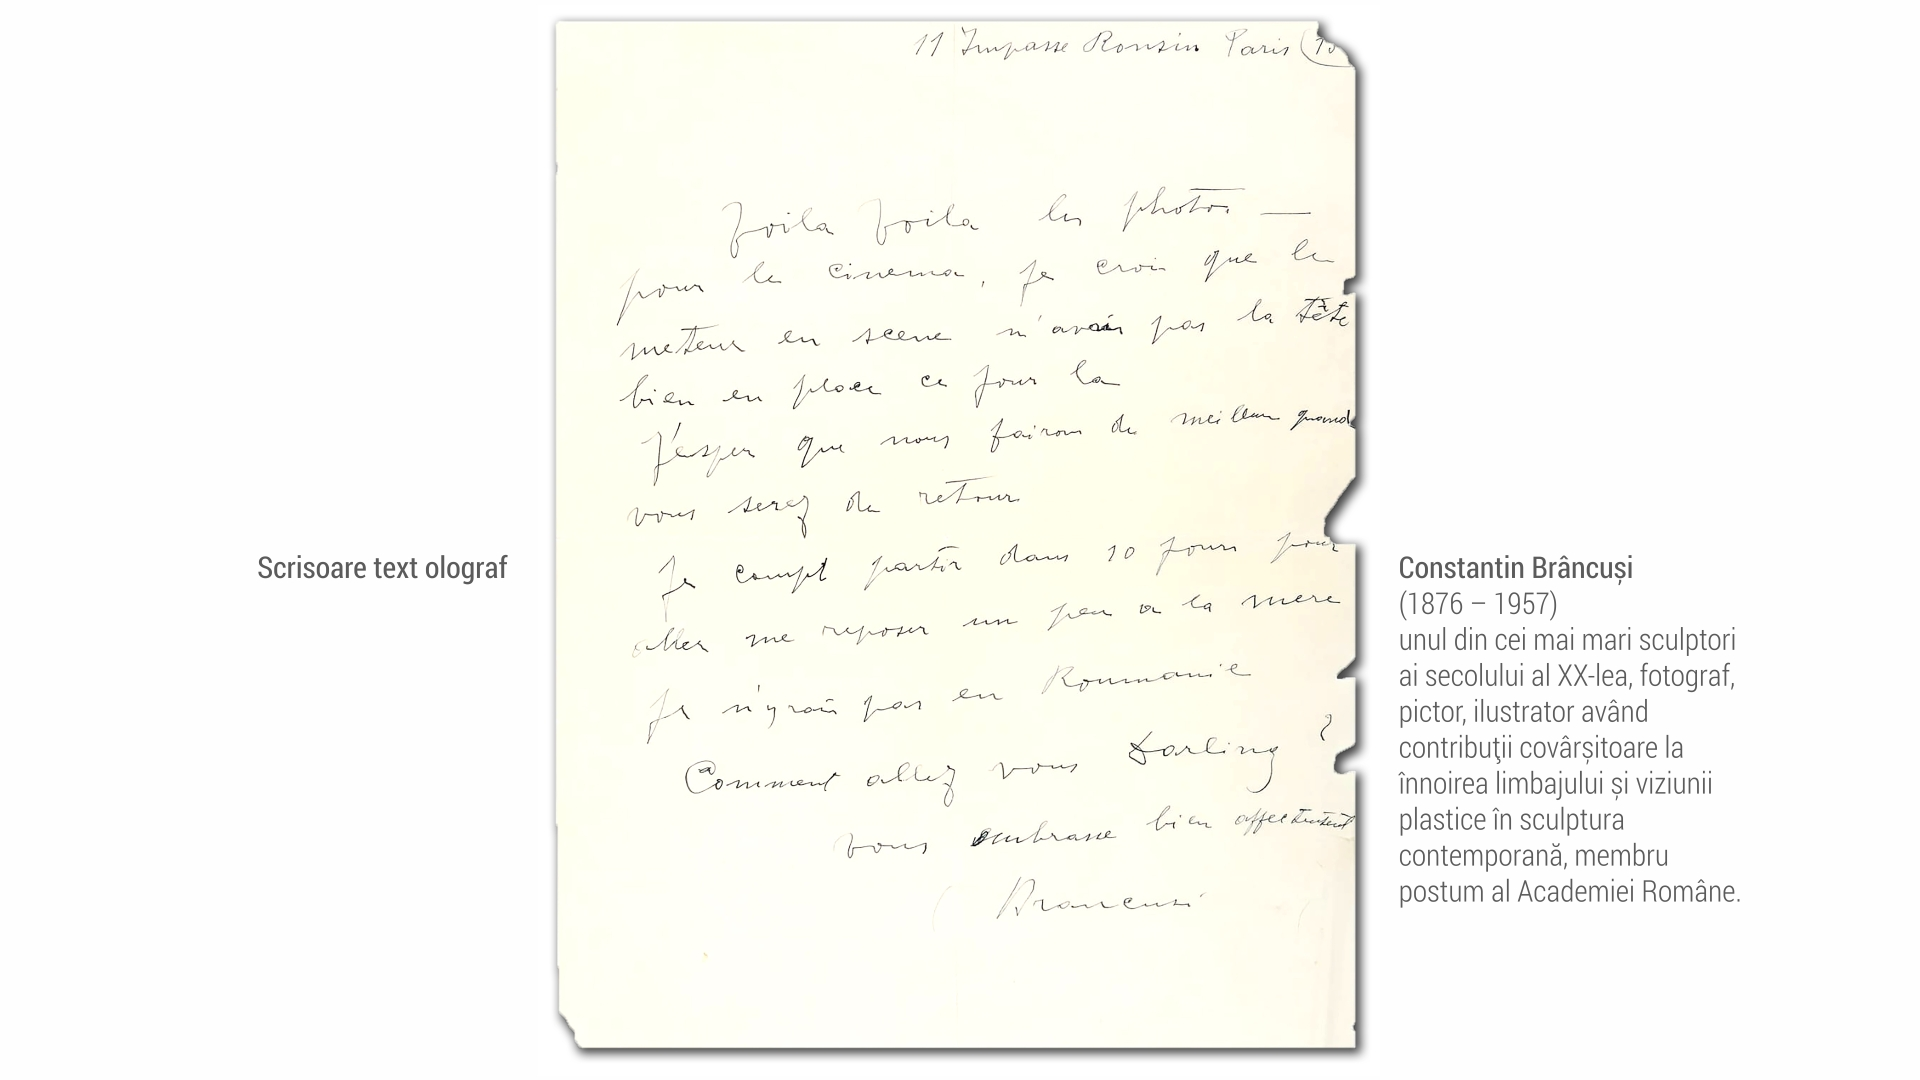 1876 Constantin Brancusi - scrisoare